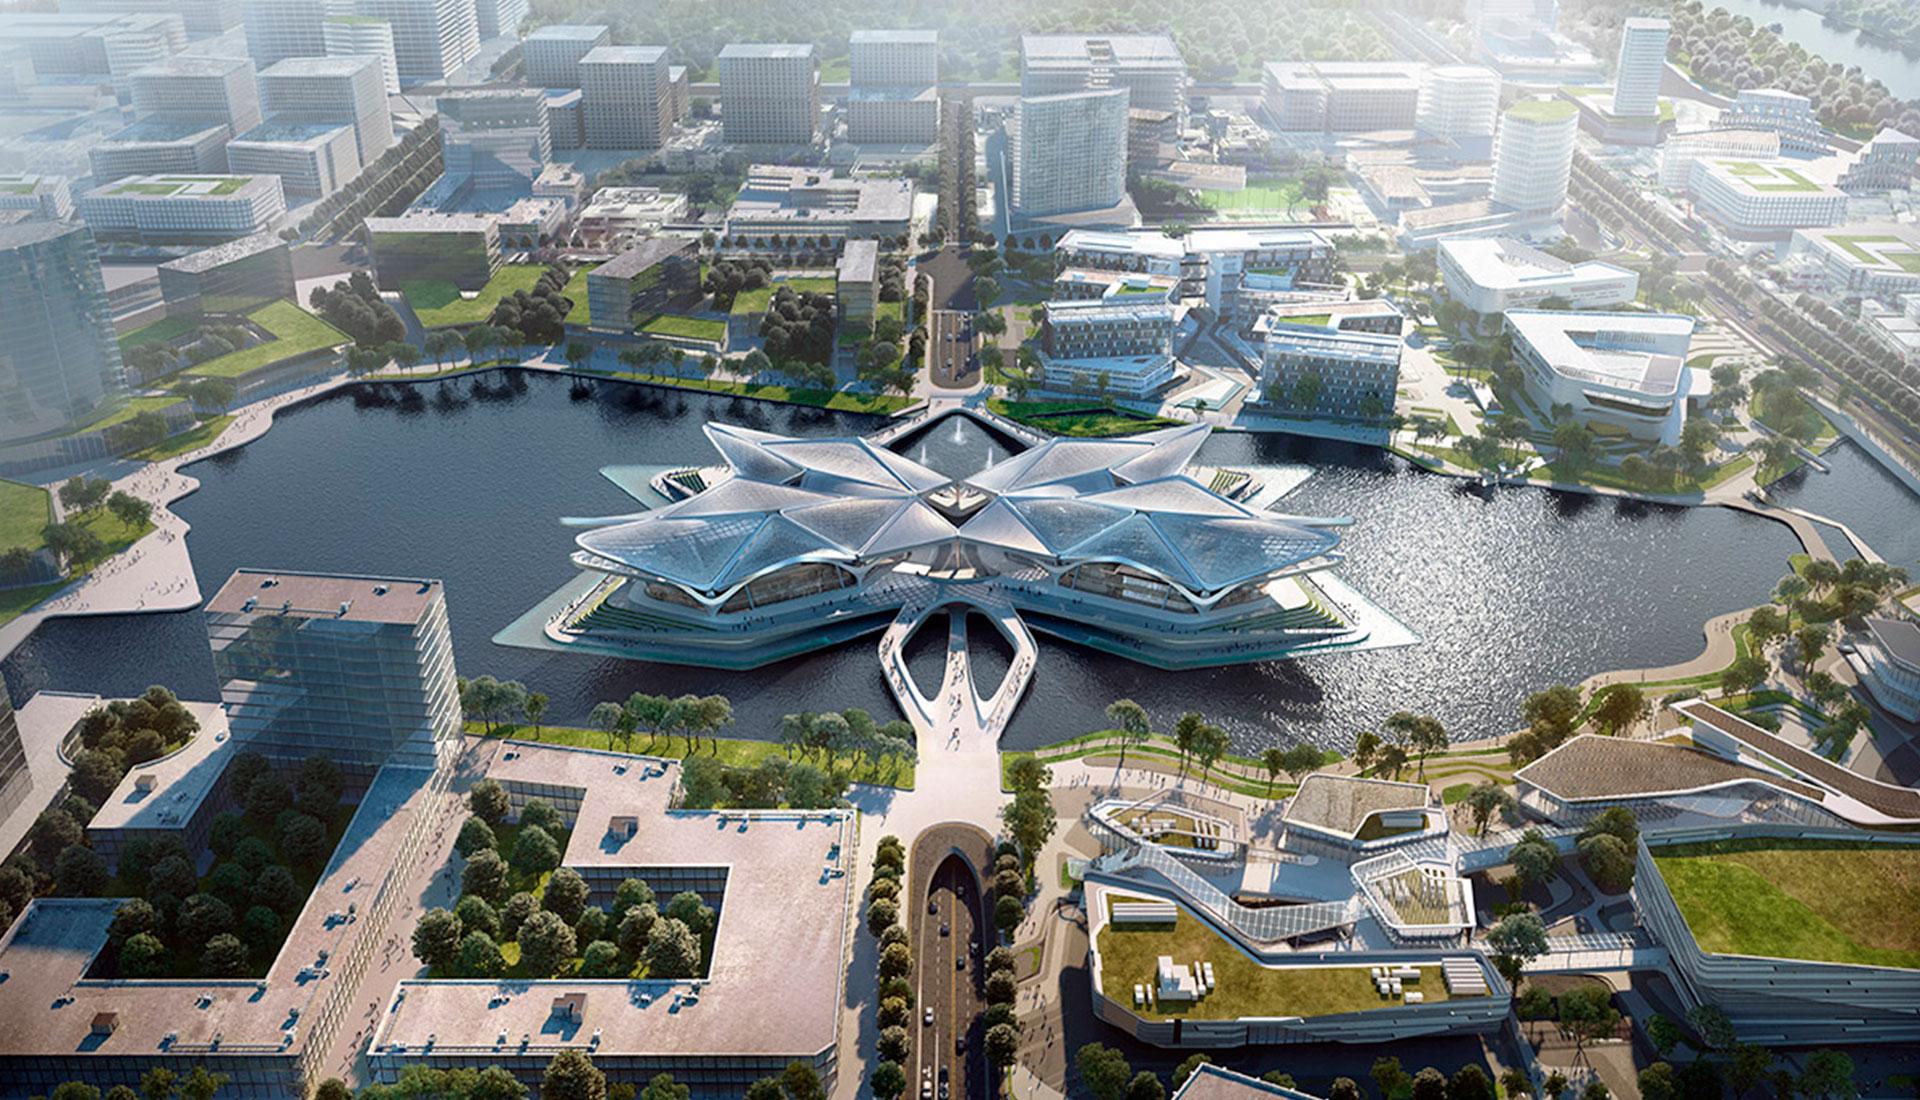 Zaha Hadid Architects строят энергоэффективный арт-центр